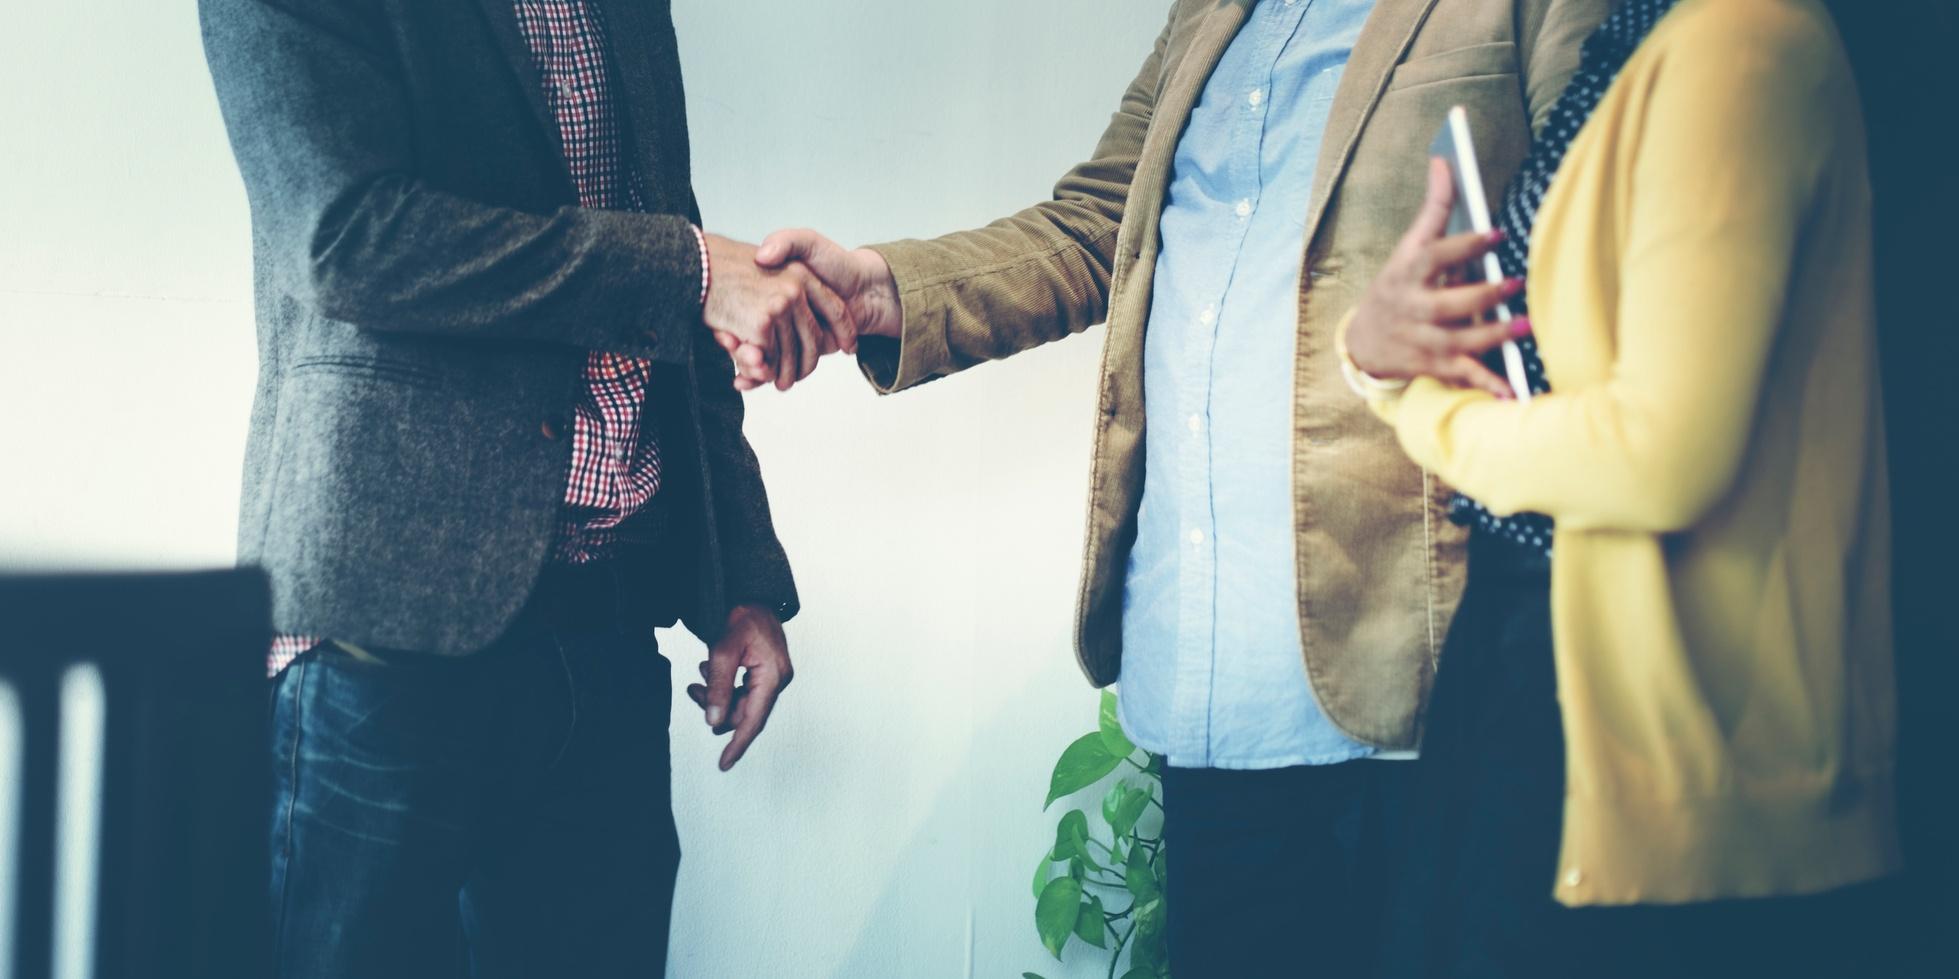 Business-Team-Partnership-Greeting-Handshake-Concept-000080824521_Medium.jpg